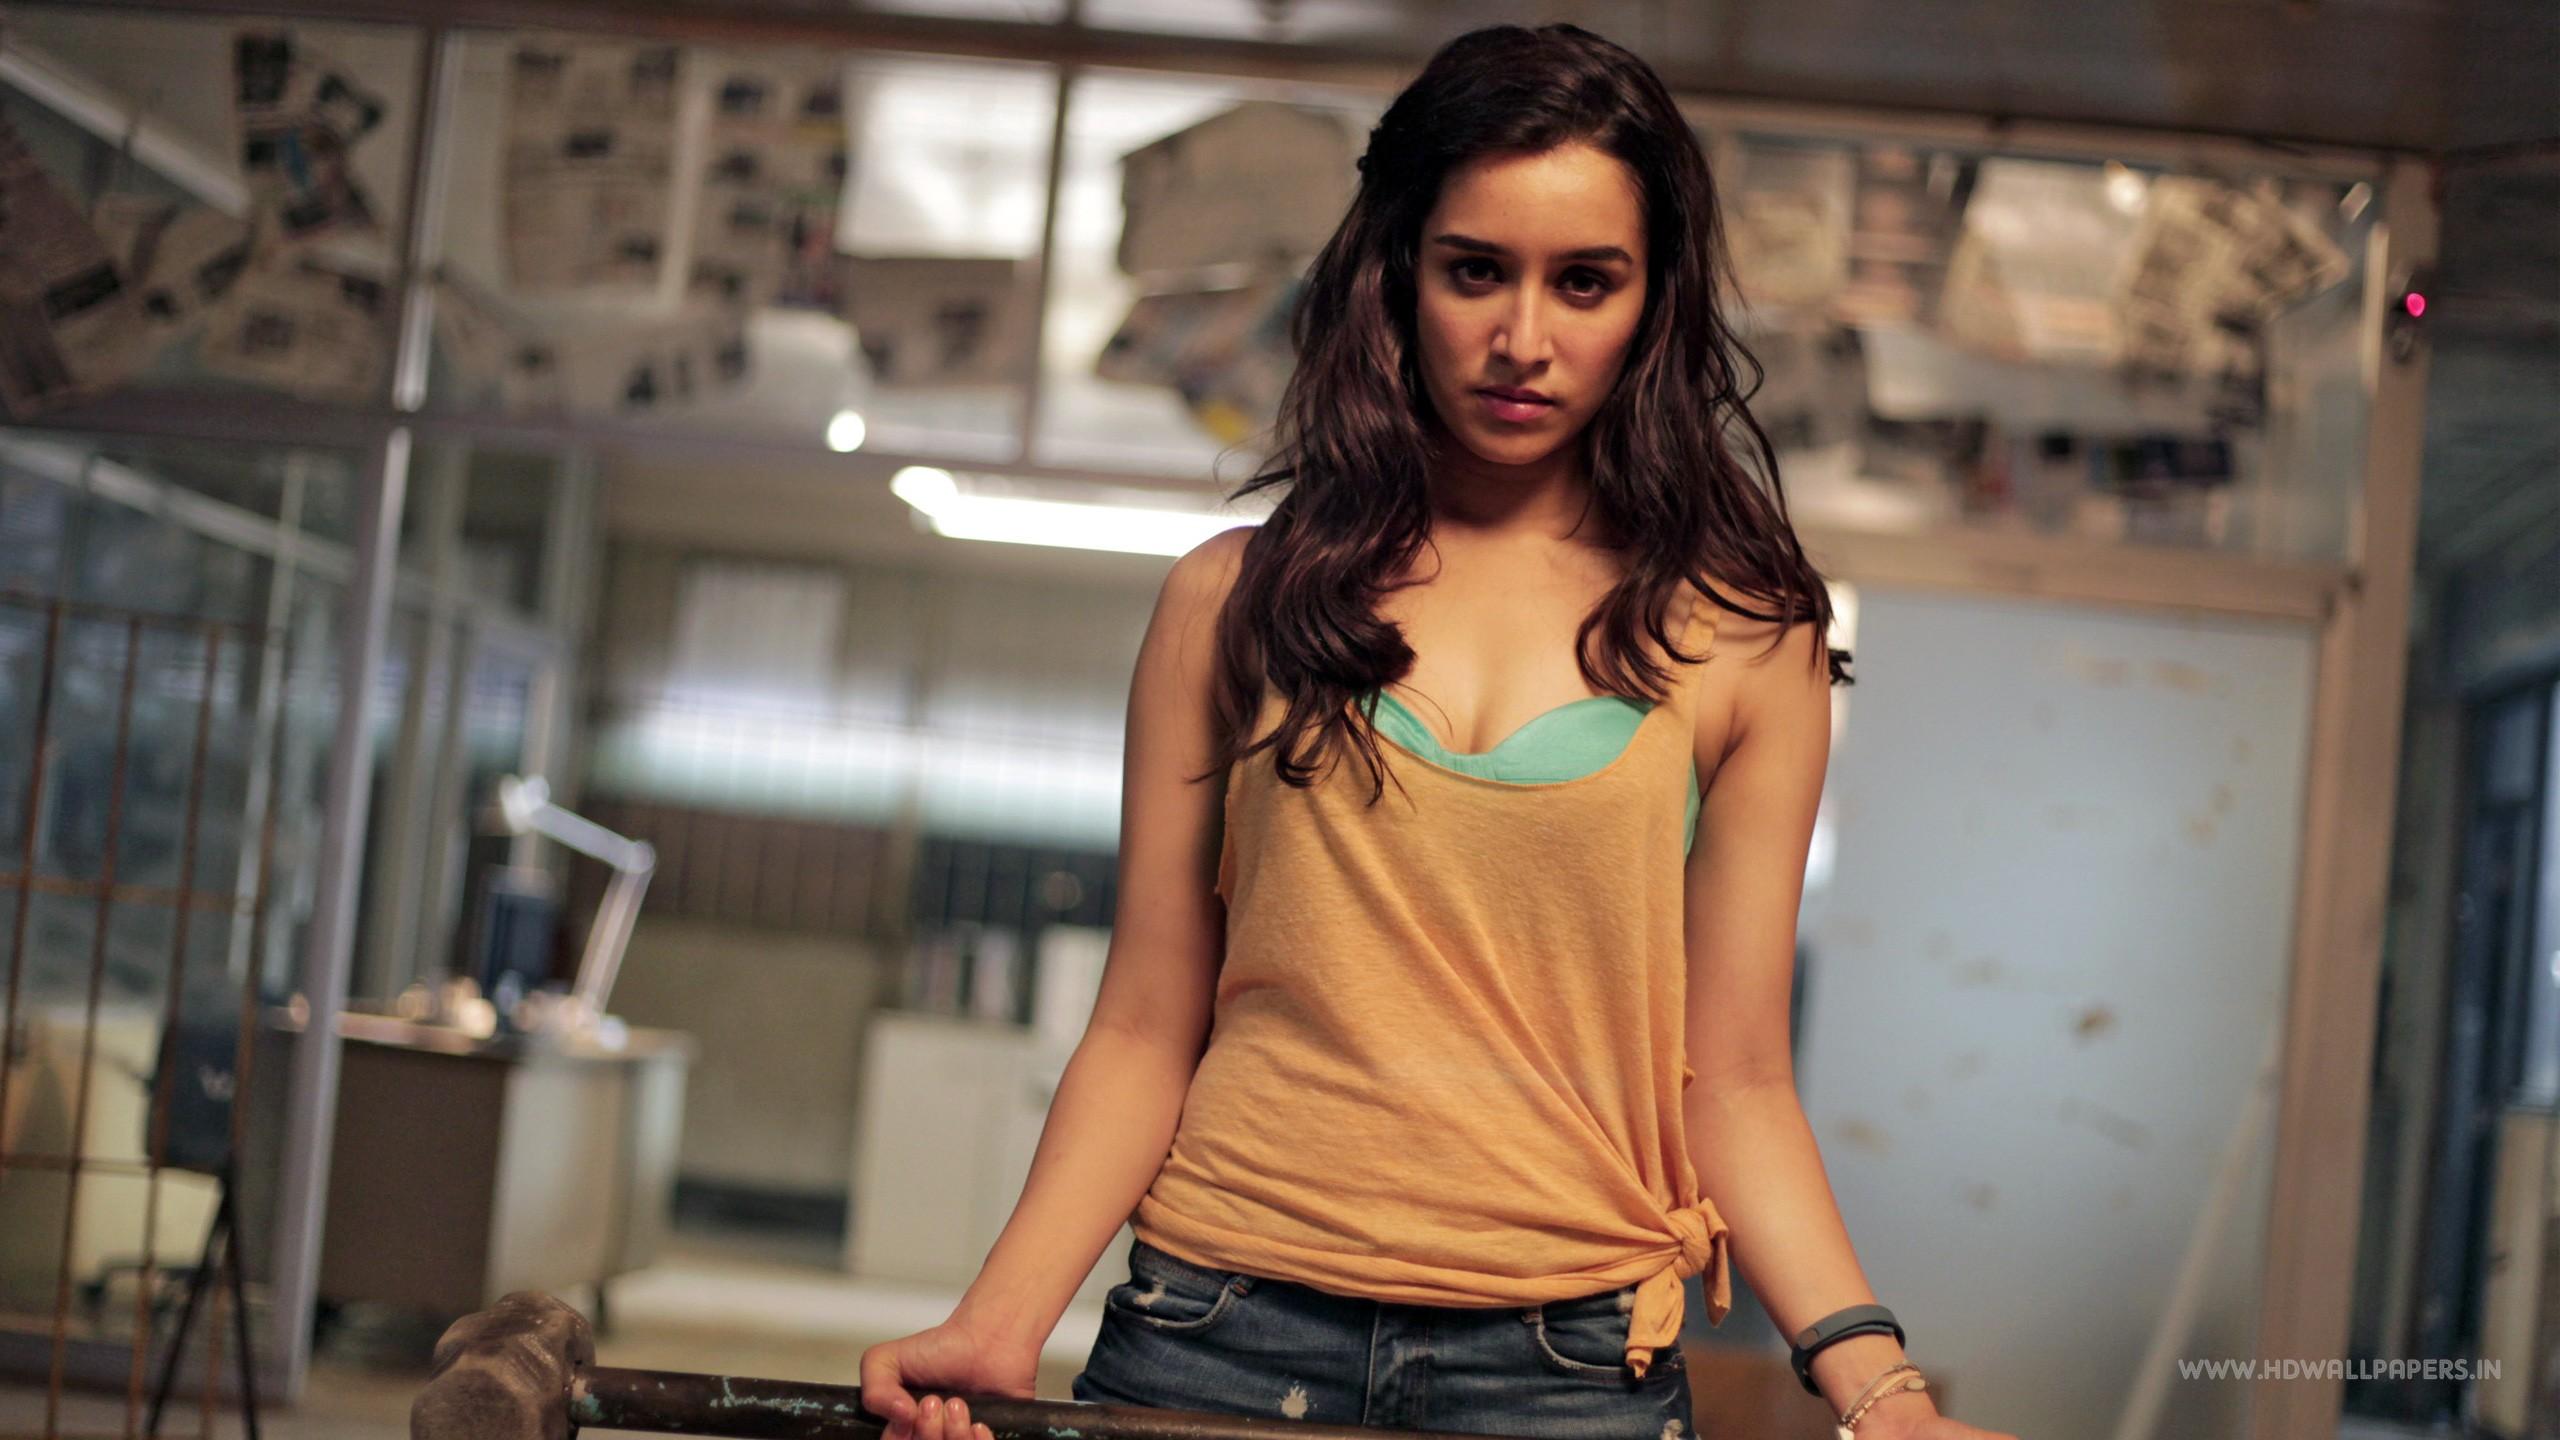 Tomb Raider Iphone 5 Wallpaper Baaghi Shraddha Kapoor Wallpapers Hd Wallpapers Id 17901